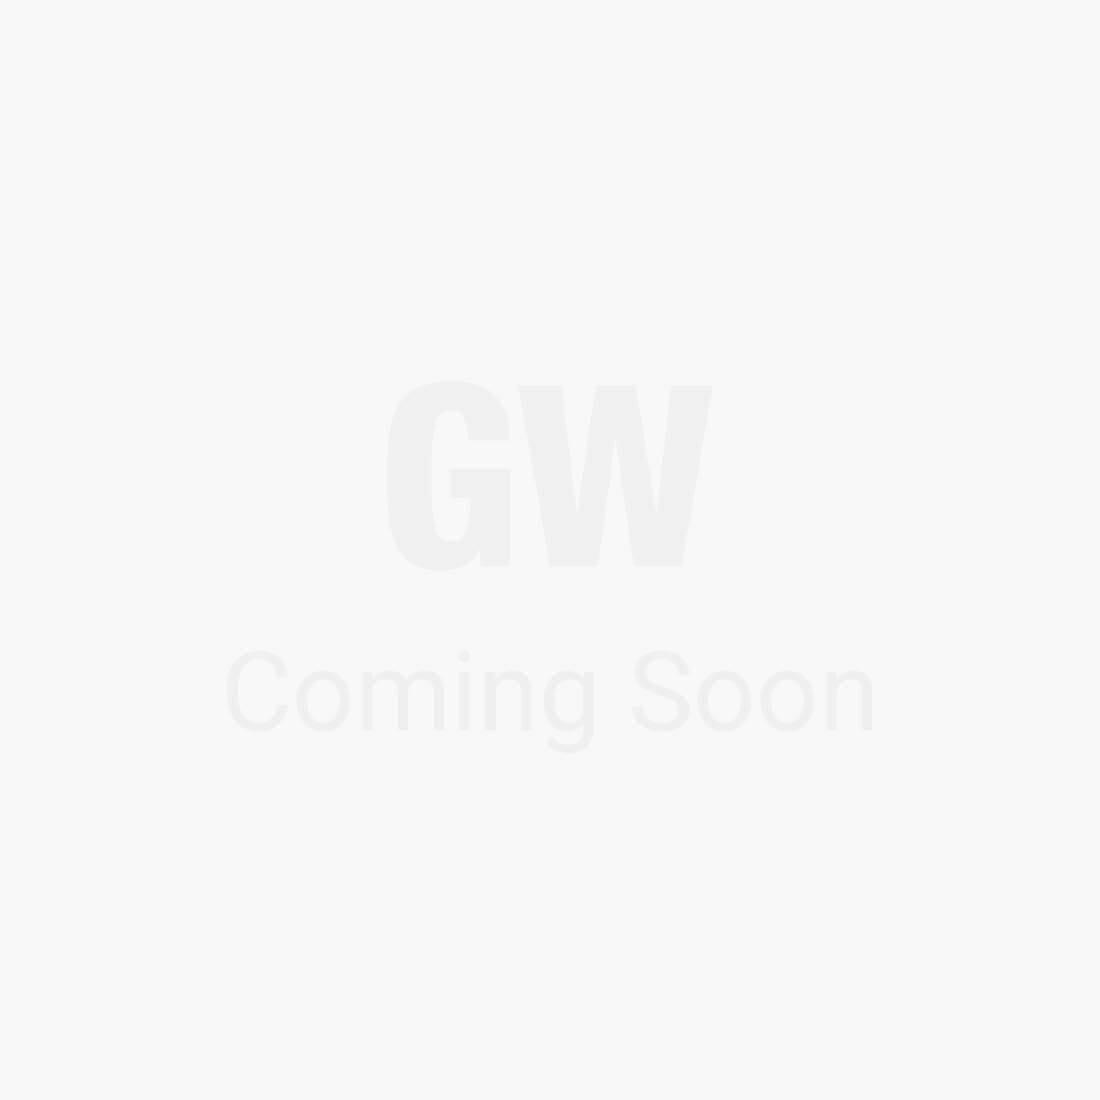 Pedro Hourglass Stool